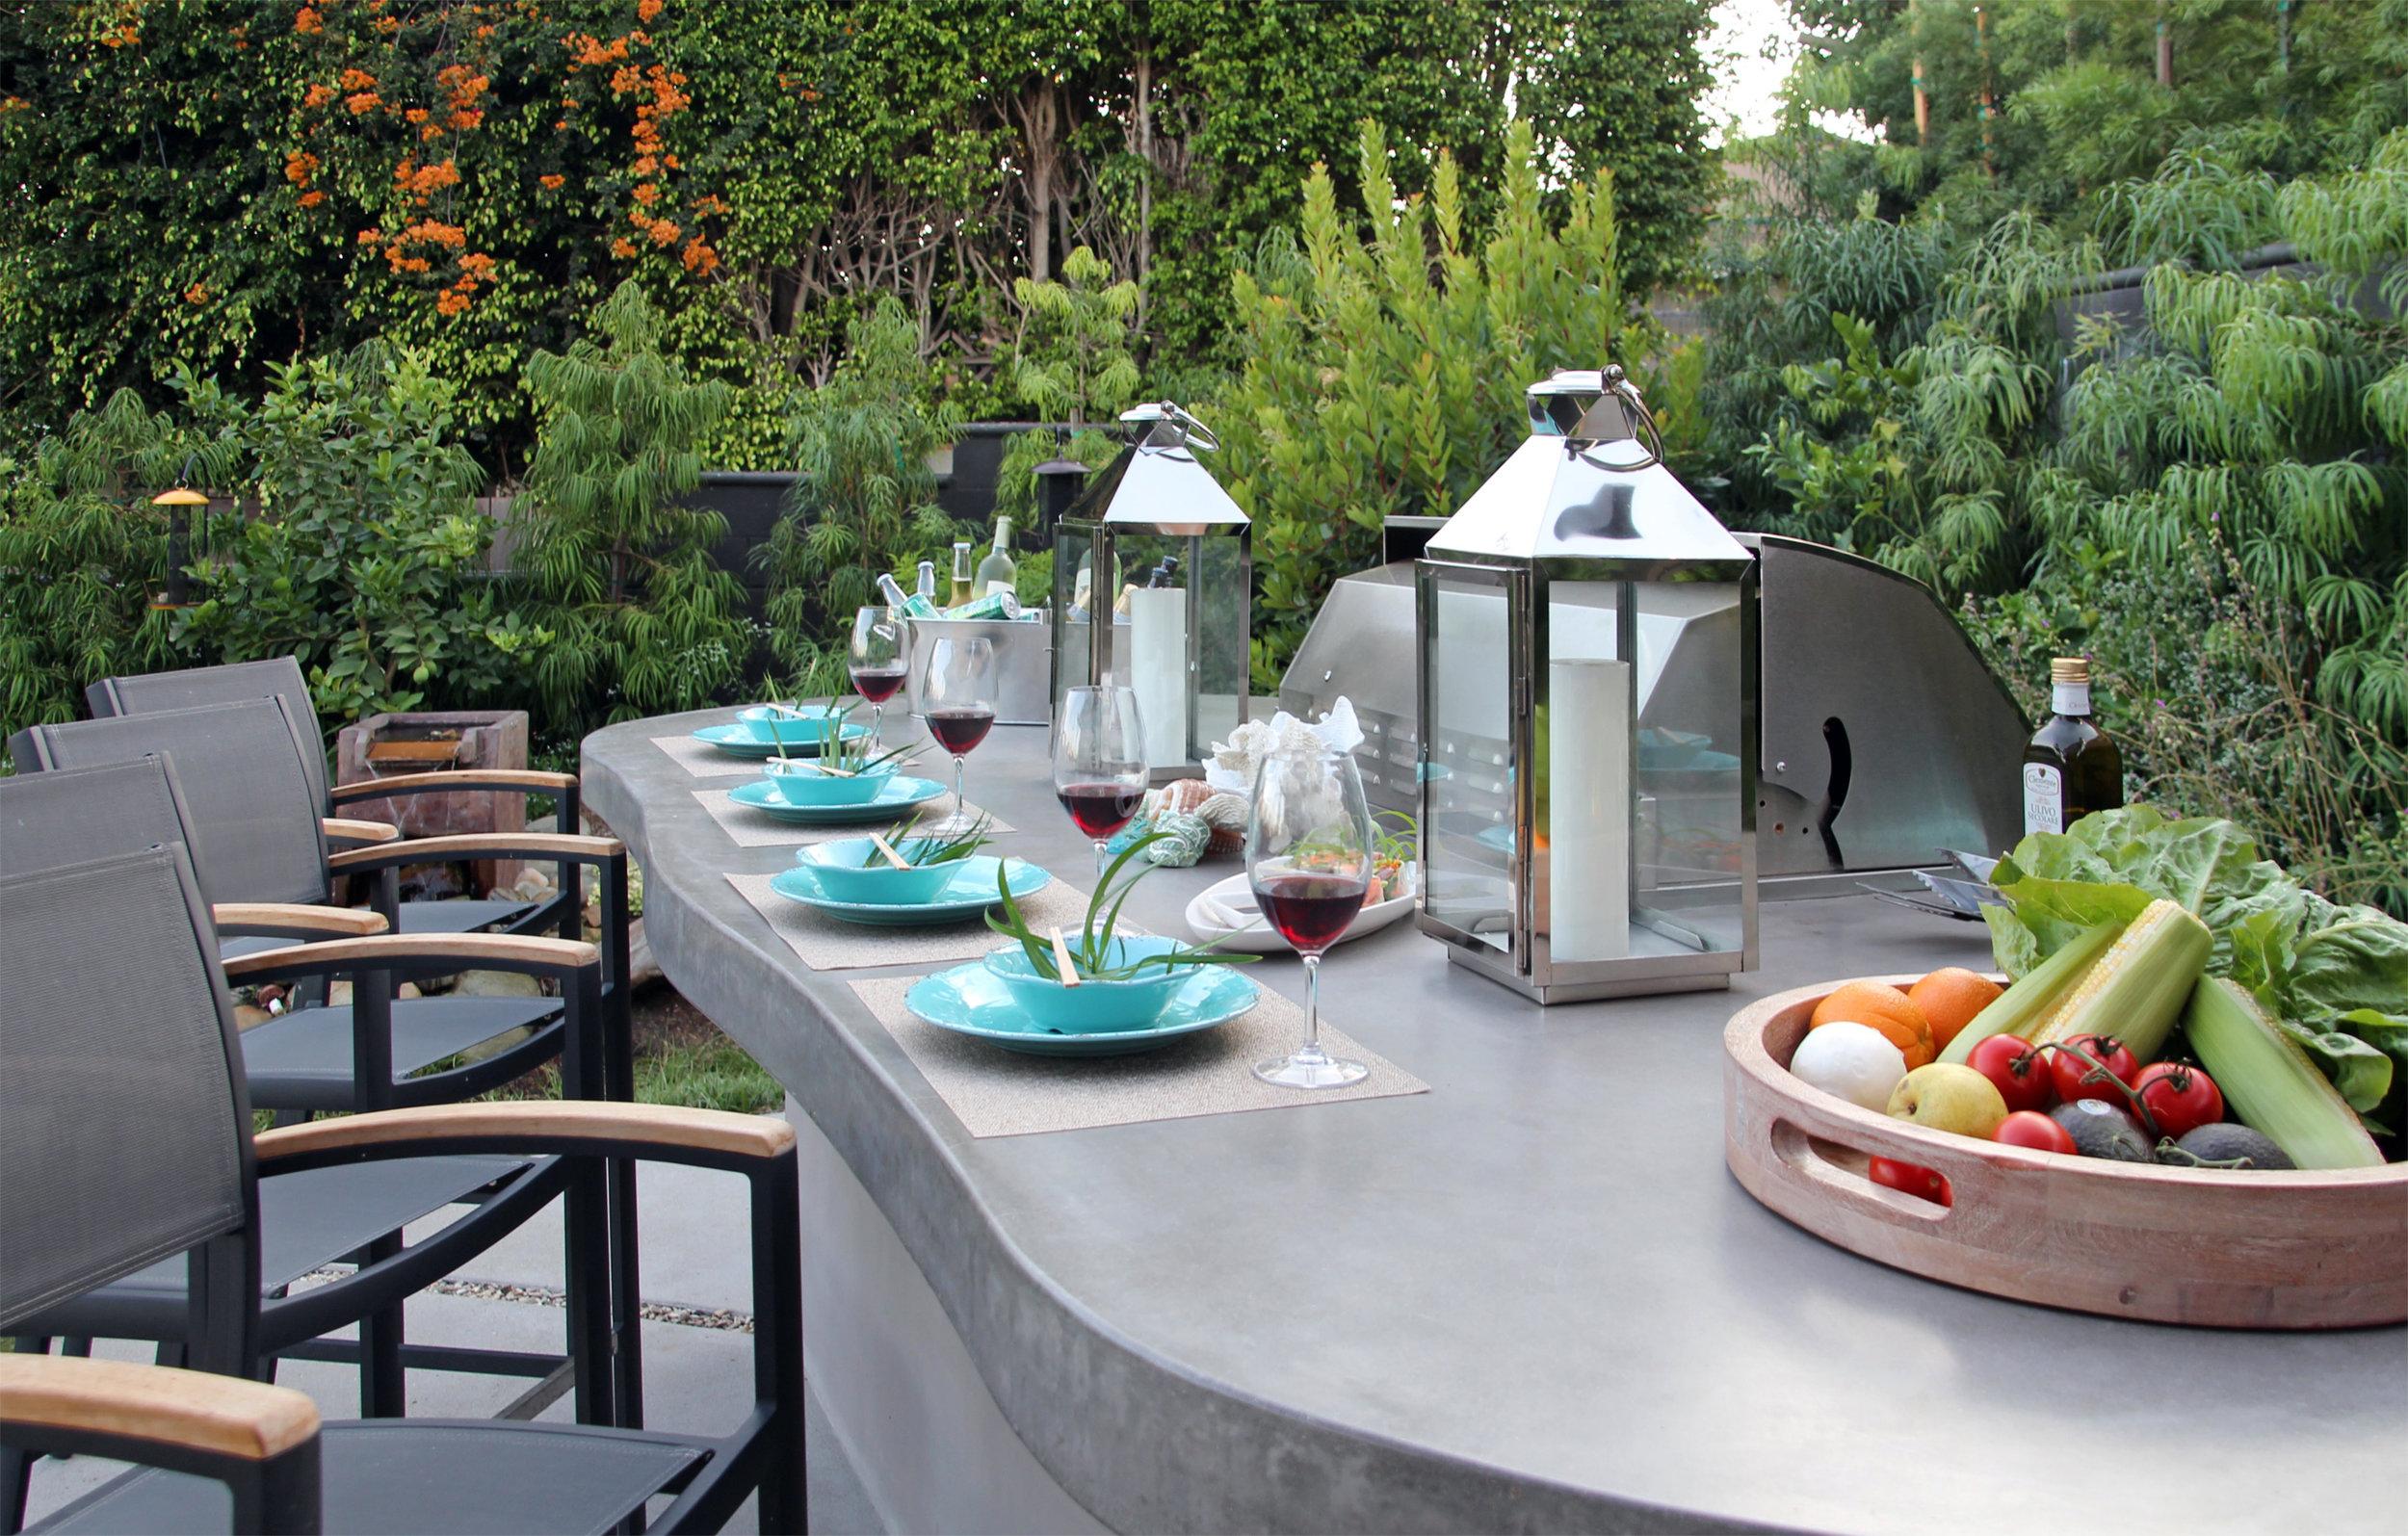 Contemporary Outdoor - Santa MonicaBBQ & islandRound Fire tableOutdoor living roomPrivacy Planting